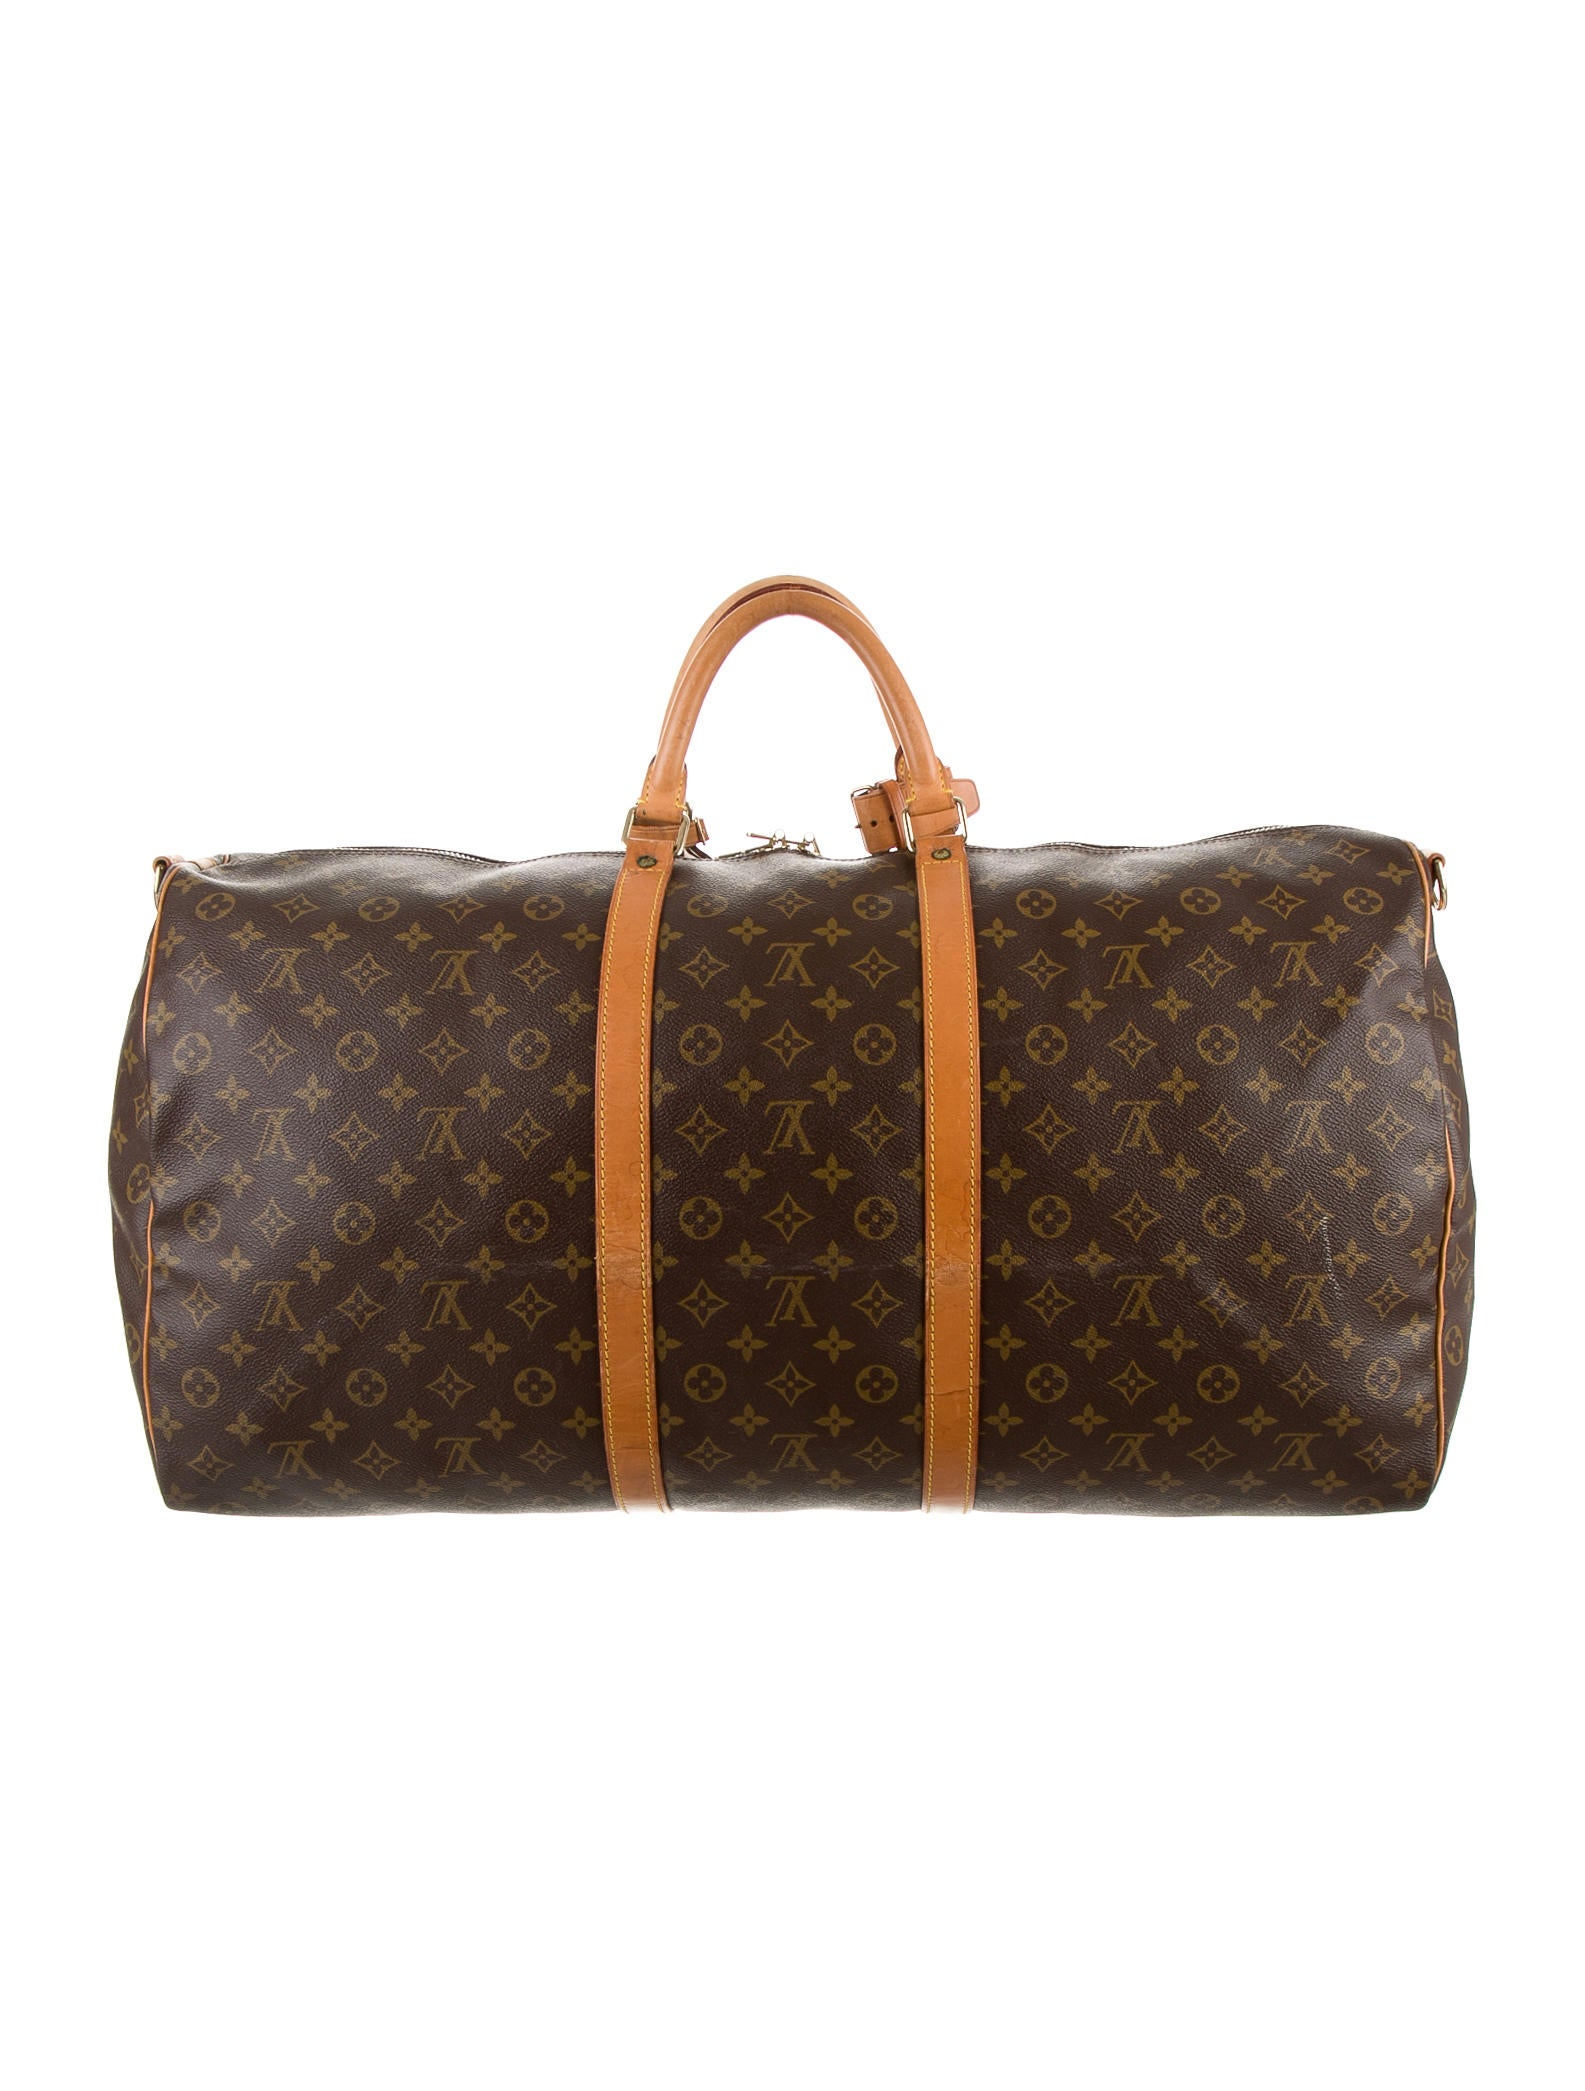 louis vuitton keepall bandouli re 60 handbags lou65290. Black Bedroom Furniture Sets. Home Design Ideas